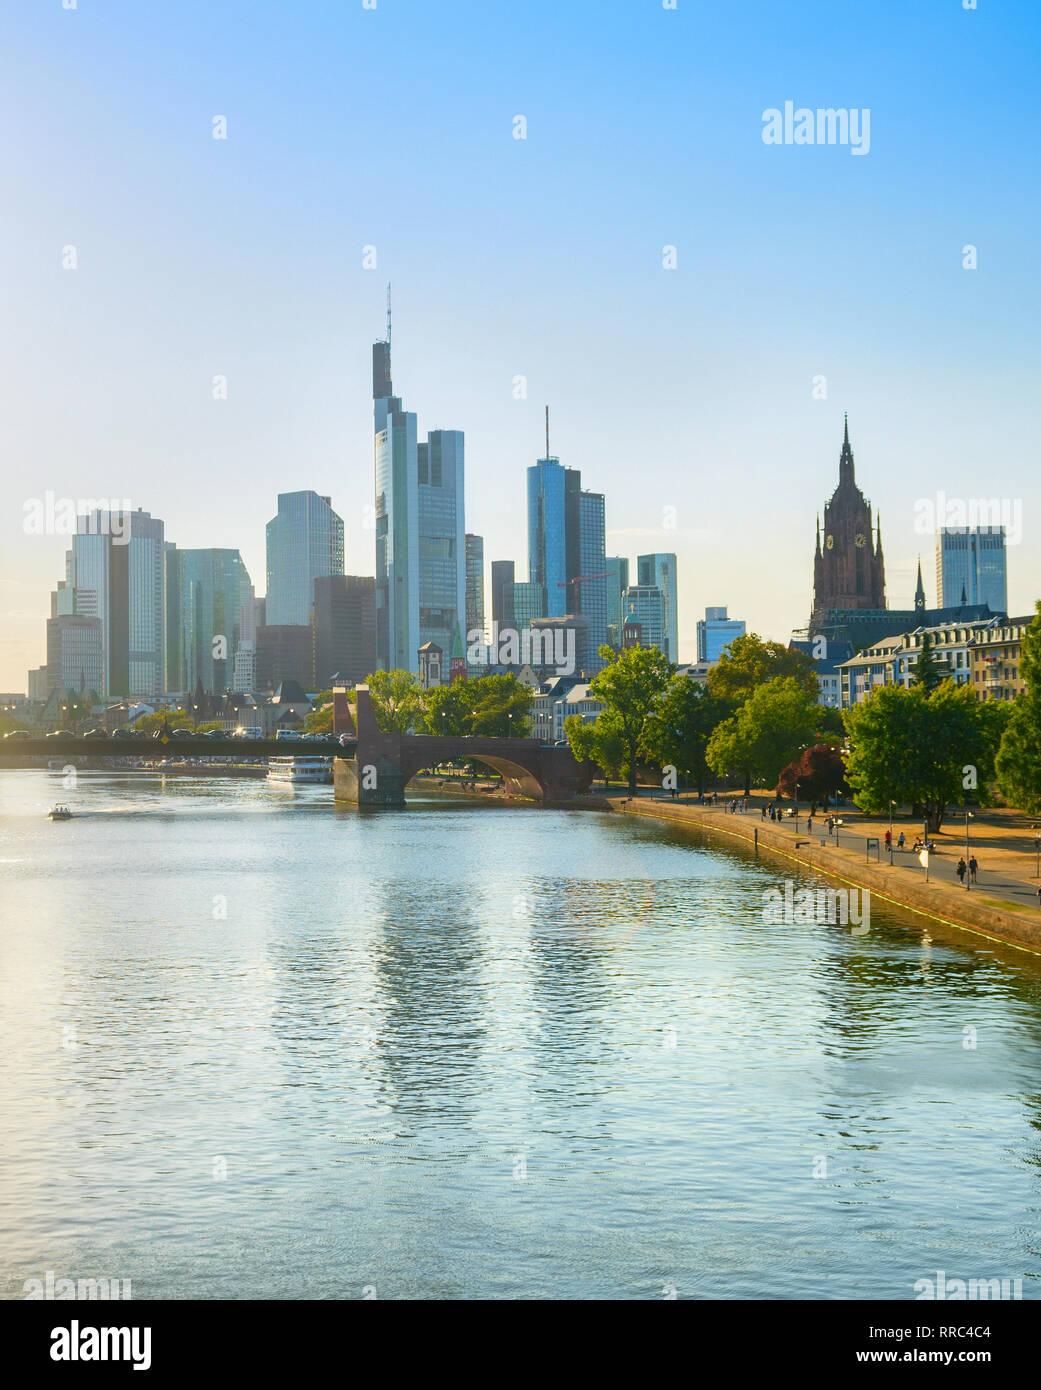 Frankfurt city skyline in bright sunshine on a summer day, Frankfurt am Main, Germany - Stock Image